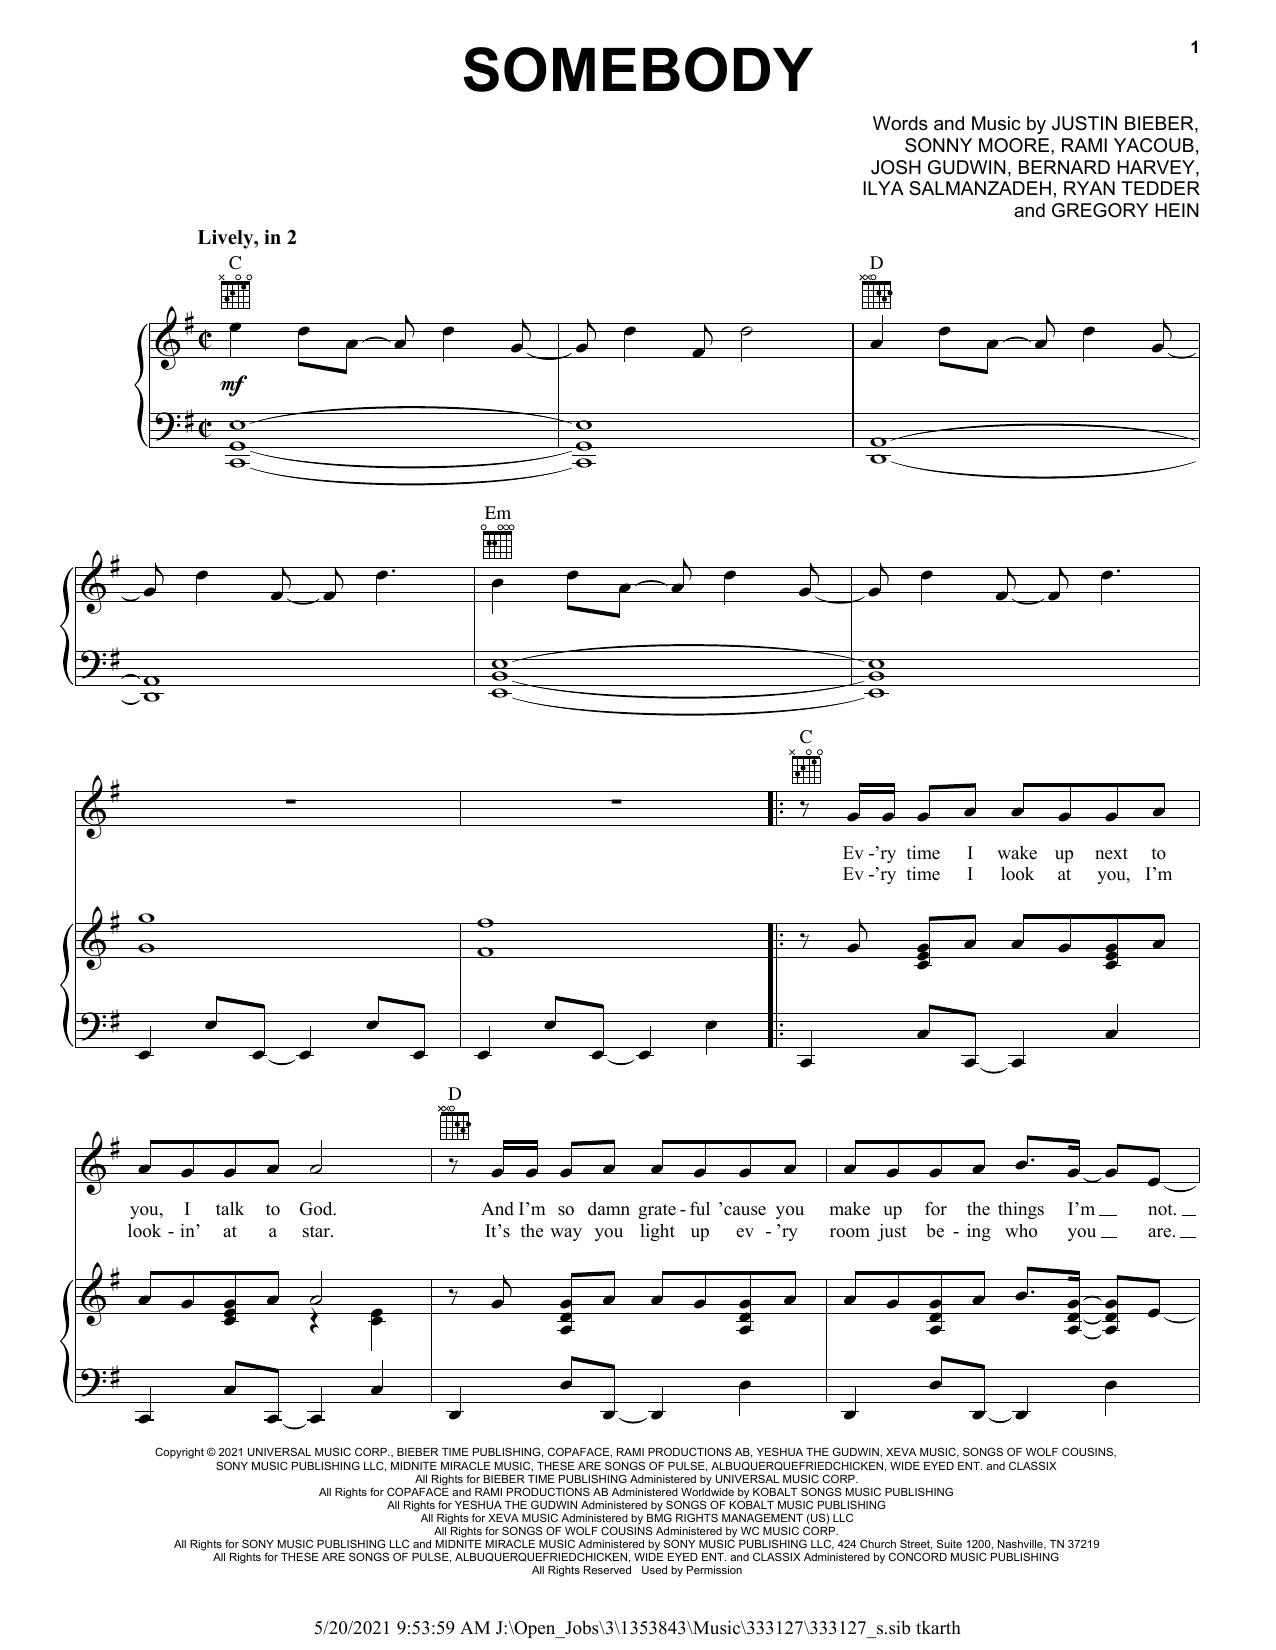 Somebody sheet music